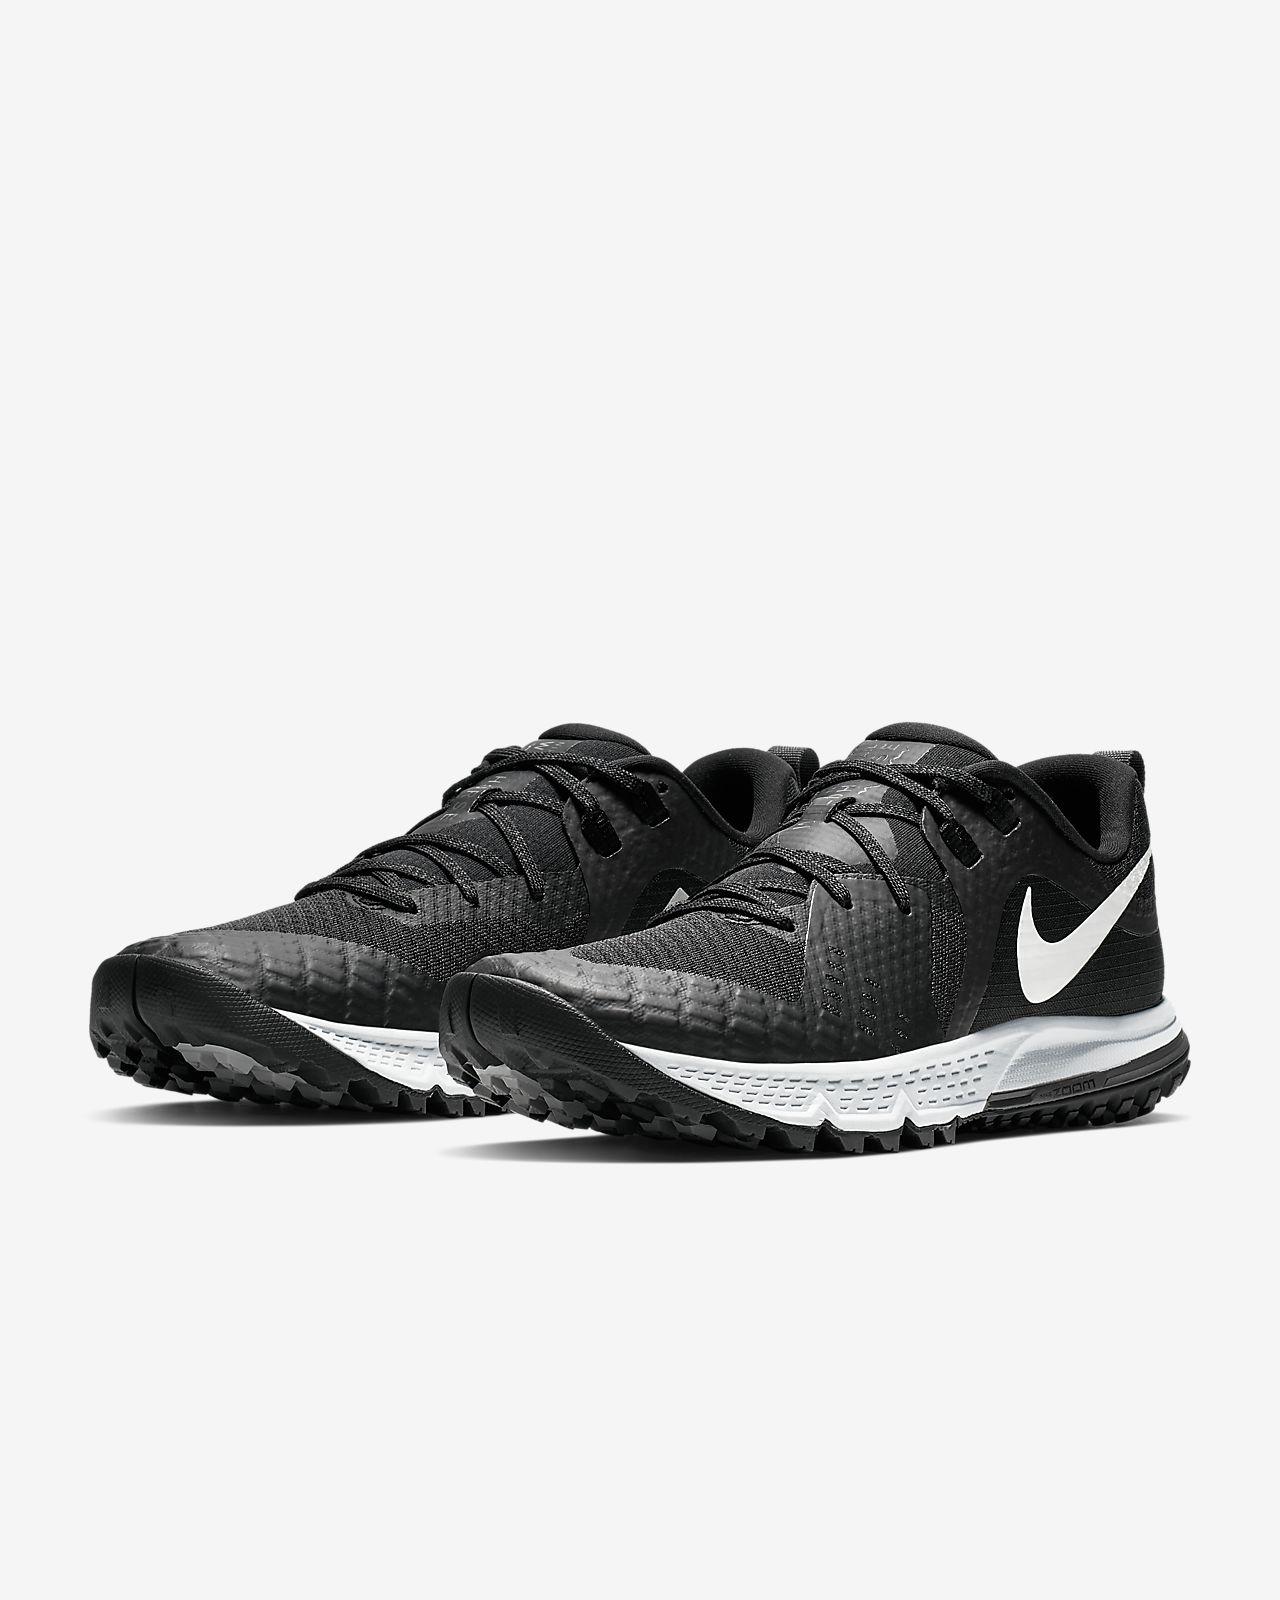 4eb492d64 Calzado de running para mujer Nike Air Zoom Wildhorse 5. Nike.com MX